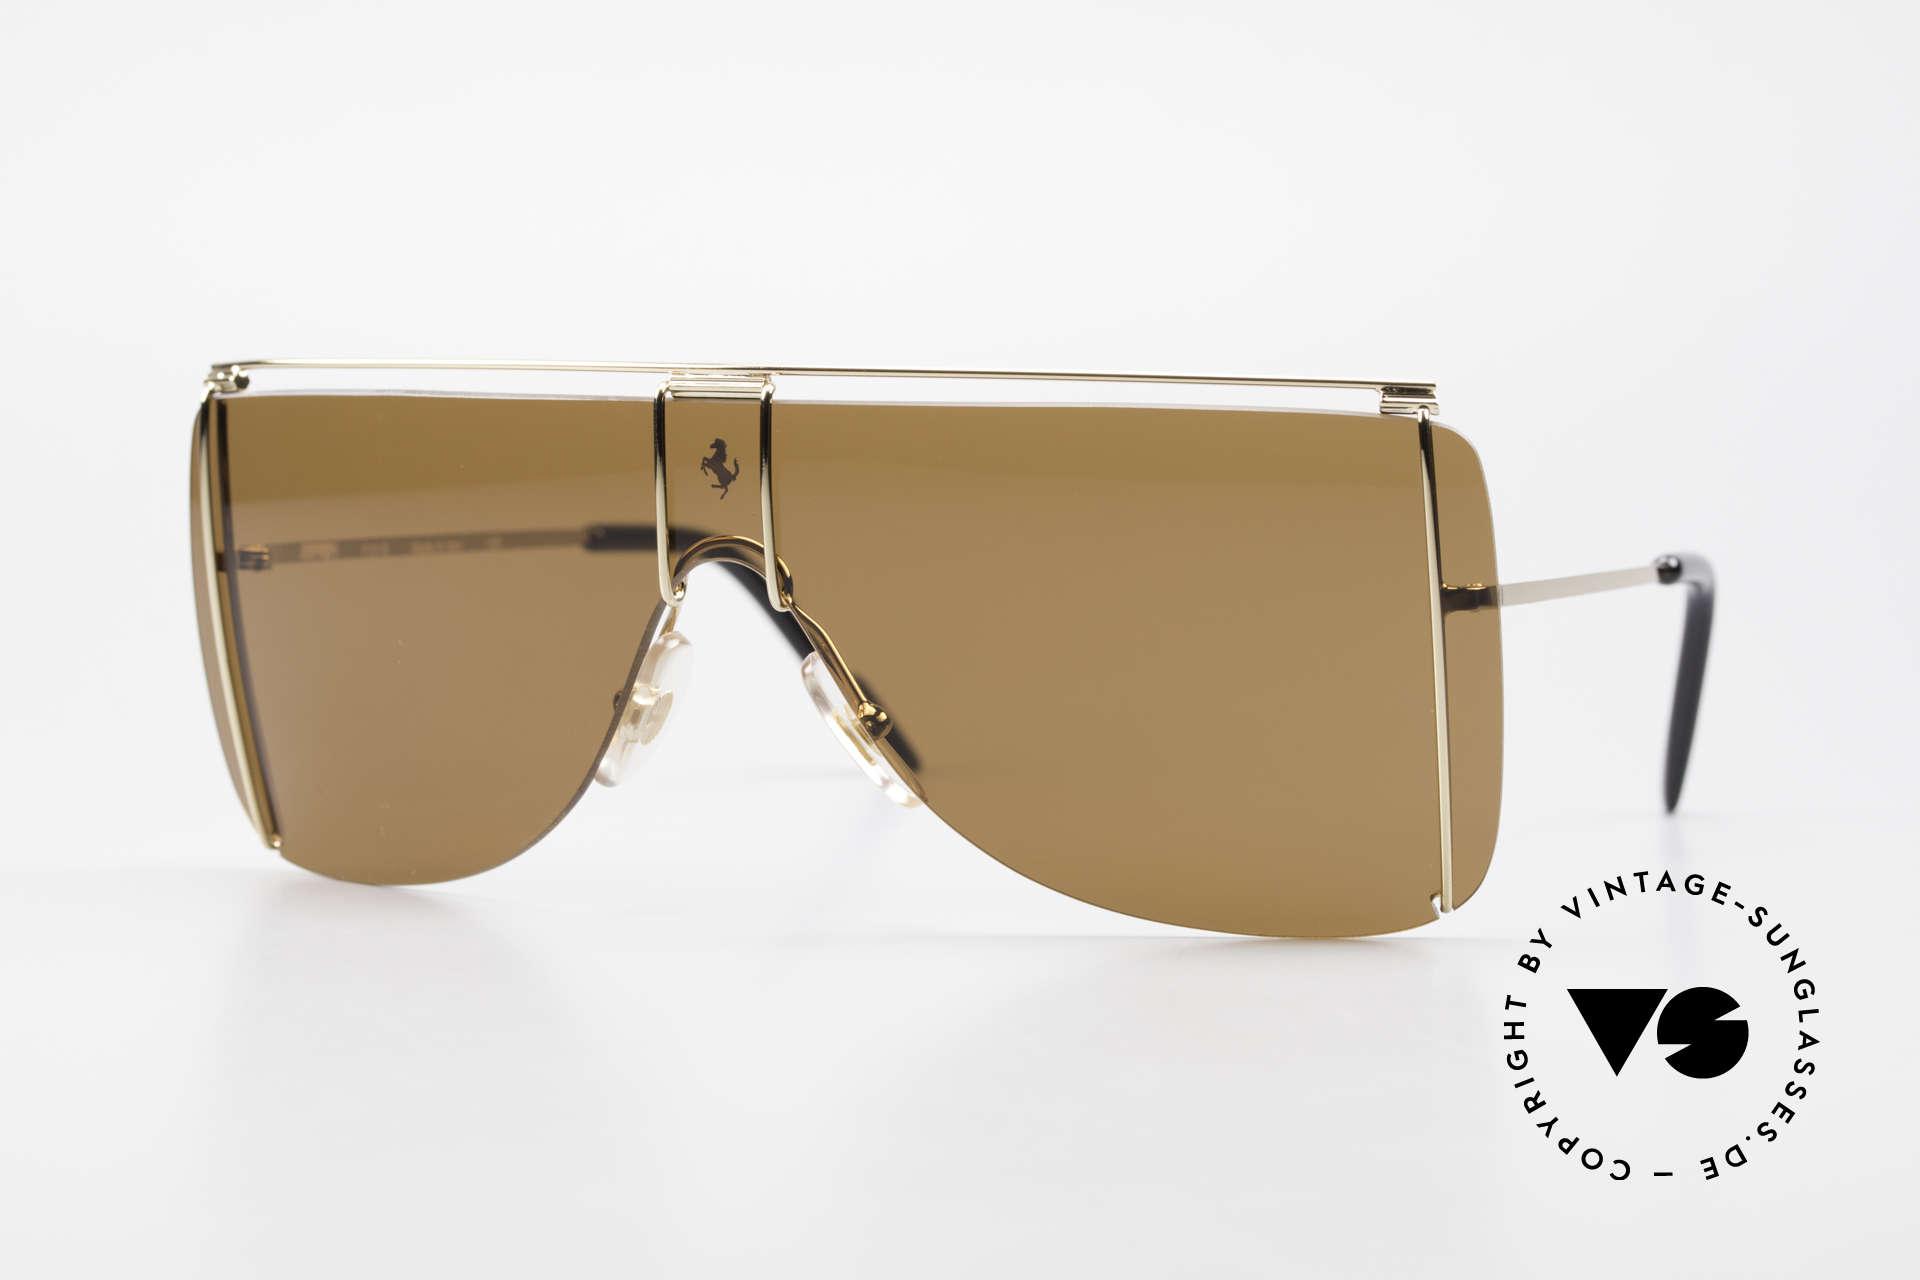 Sonnenbrillen Ferrari F20 S Kylie Jenner Sonnenbrille